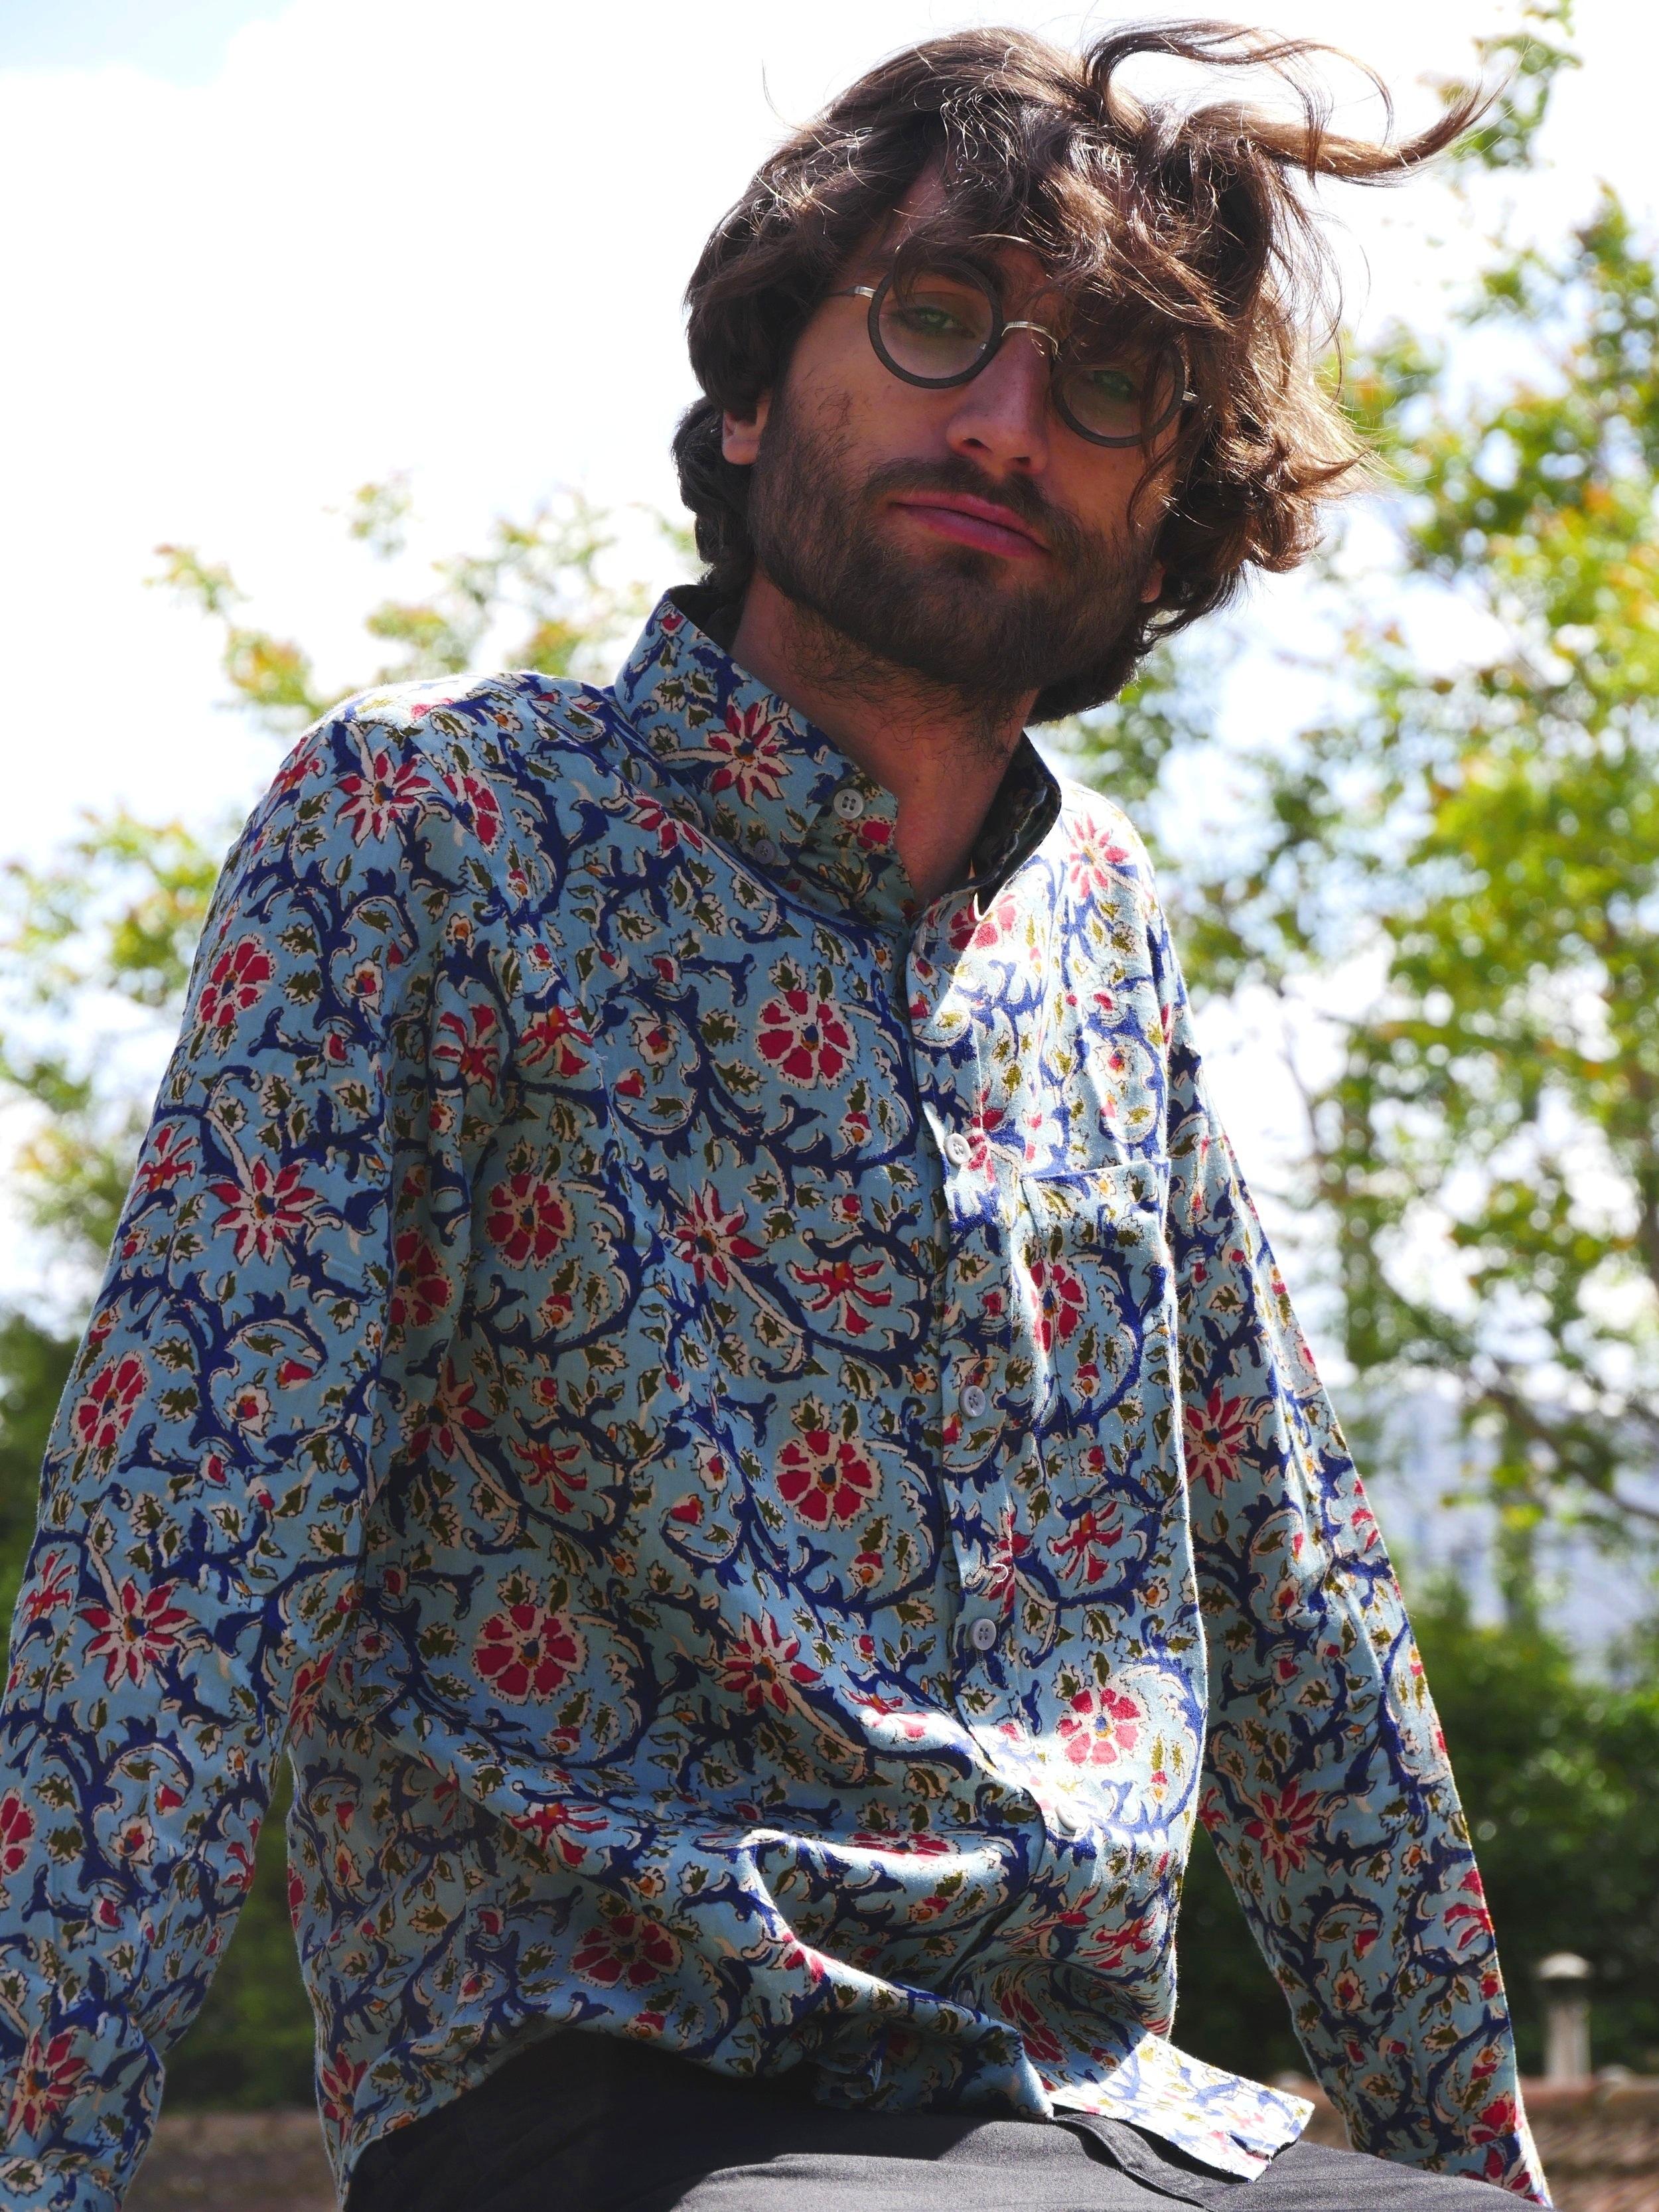 Basile Blue Alpana Shirt - 100% Indian cotton, made in Bangladesh with love